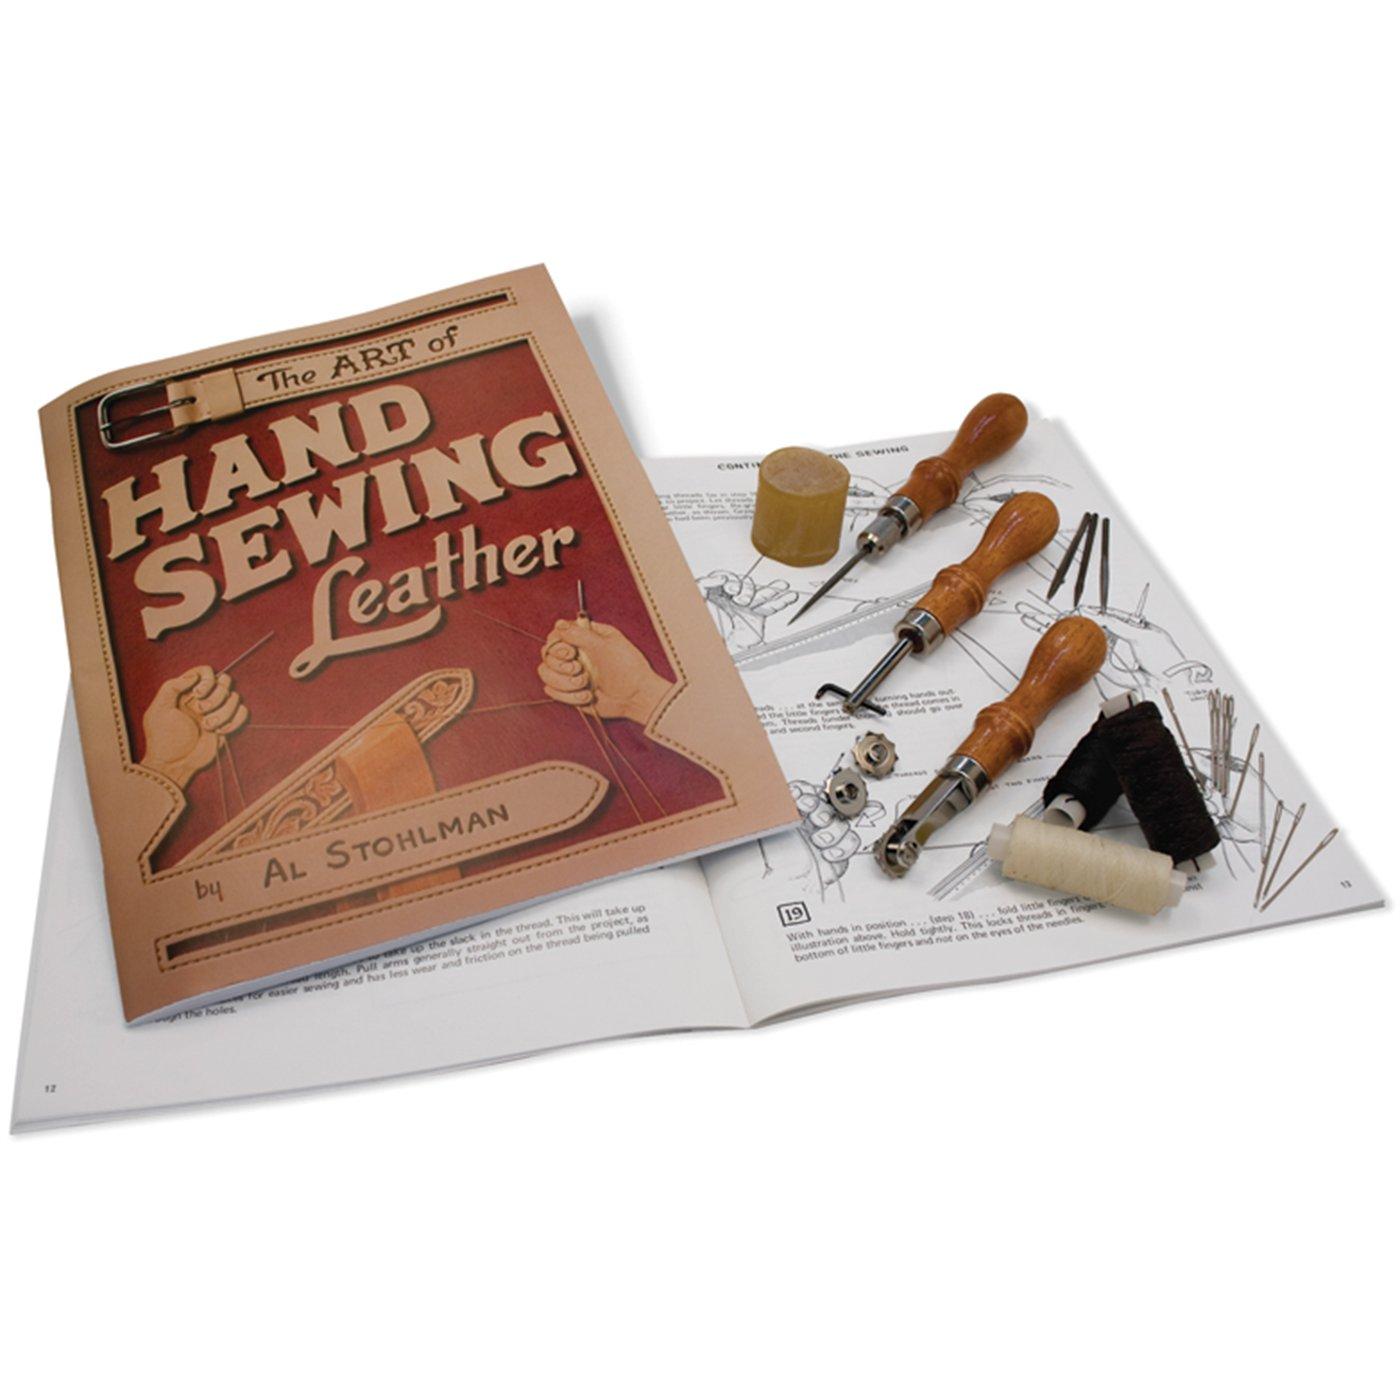 Matoirs et outils repoussage cuir fourniture 3ime commande